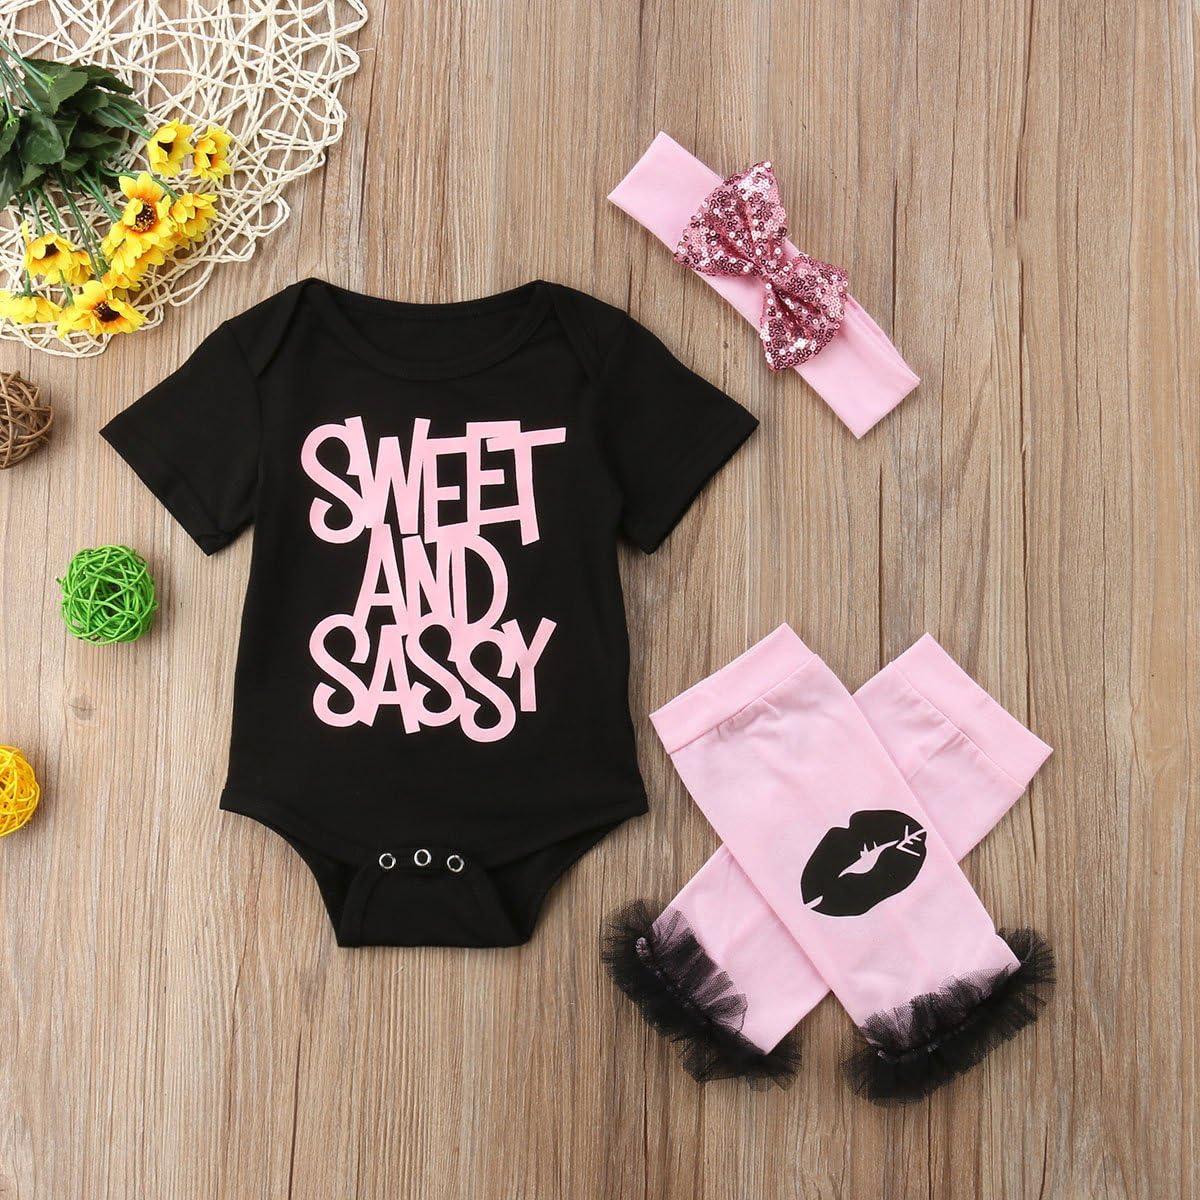 Baby Girls Sweet and Sassy Letter Romper Headband 3pcs Outfit Set Lip Legging